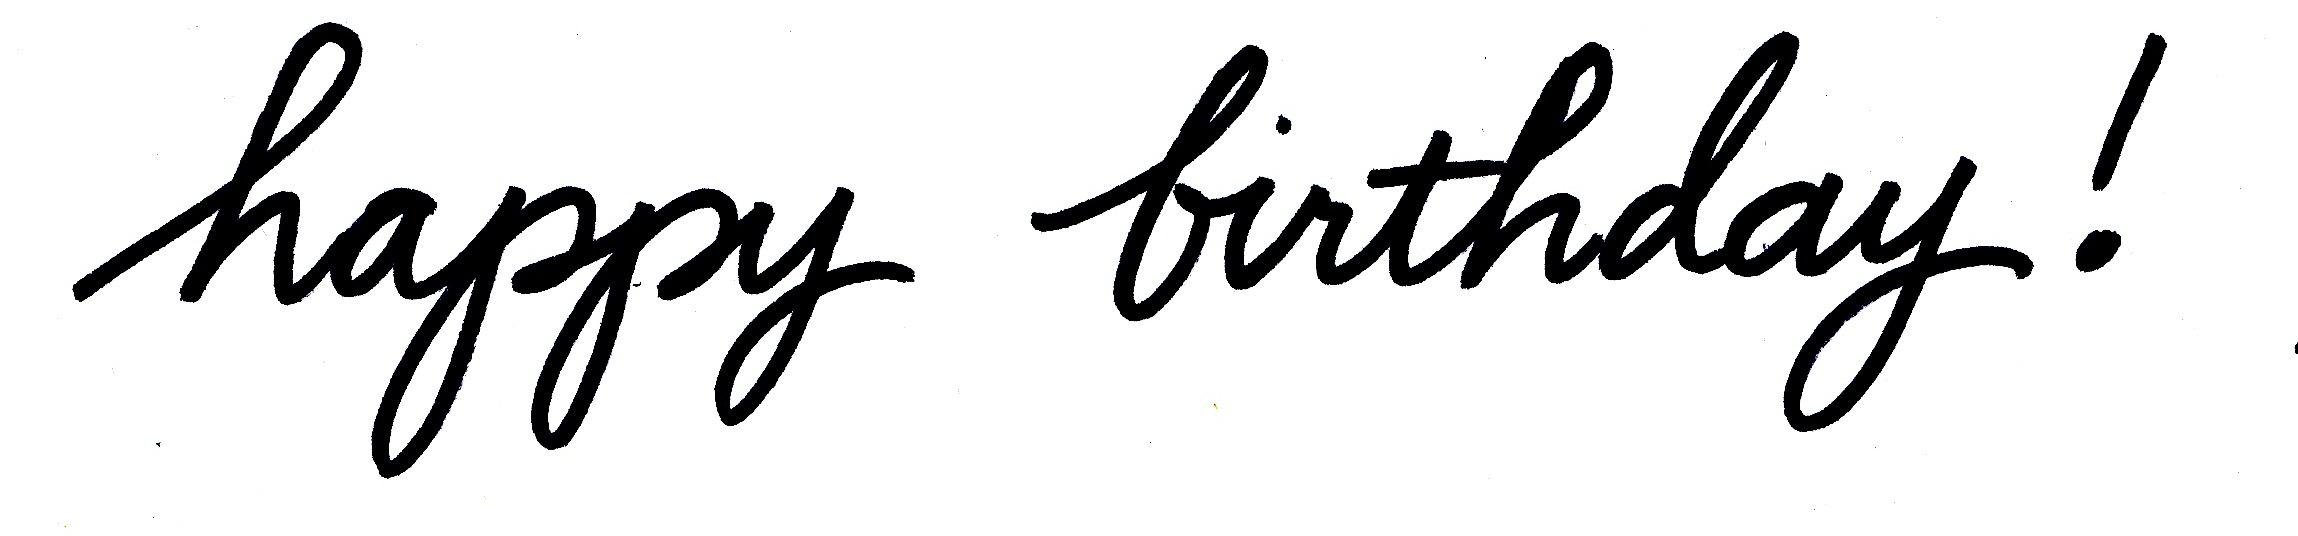 Casual Script Happy Birthday Handwritten Life